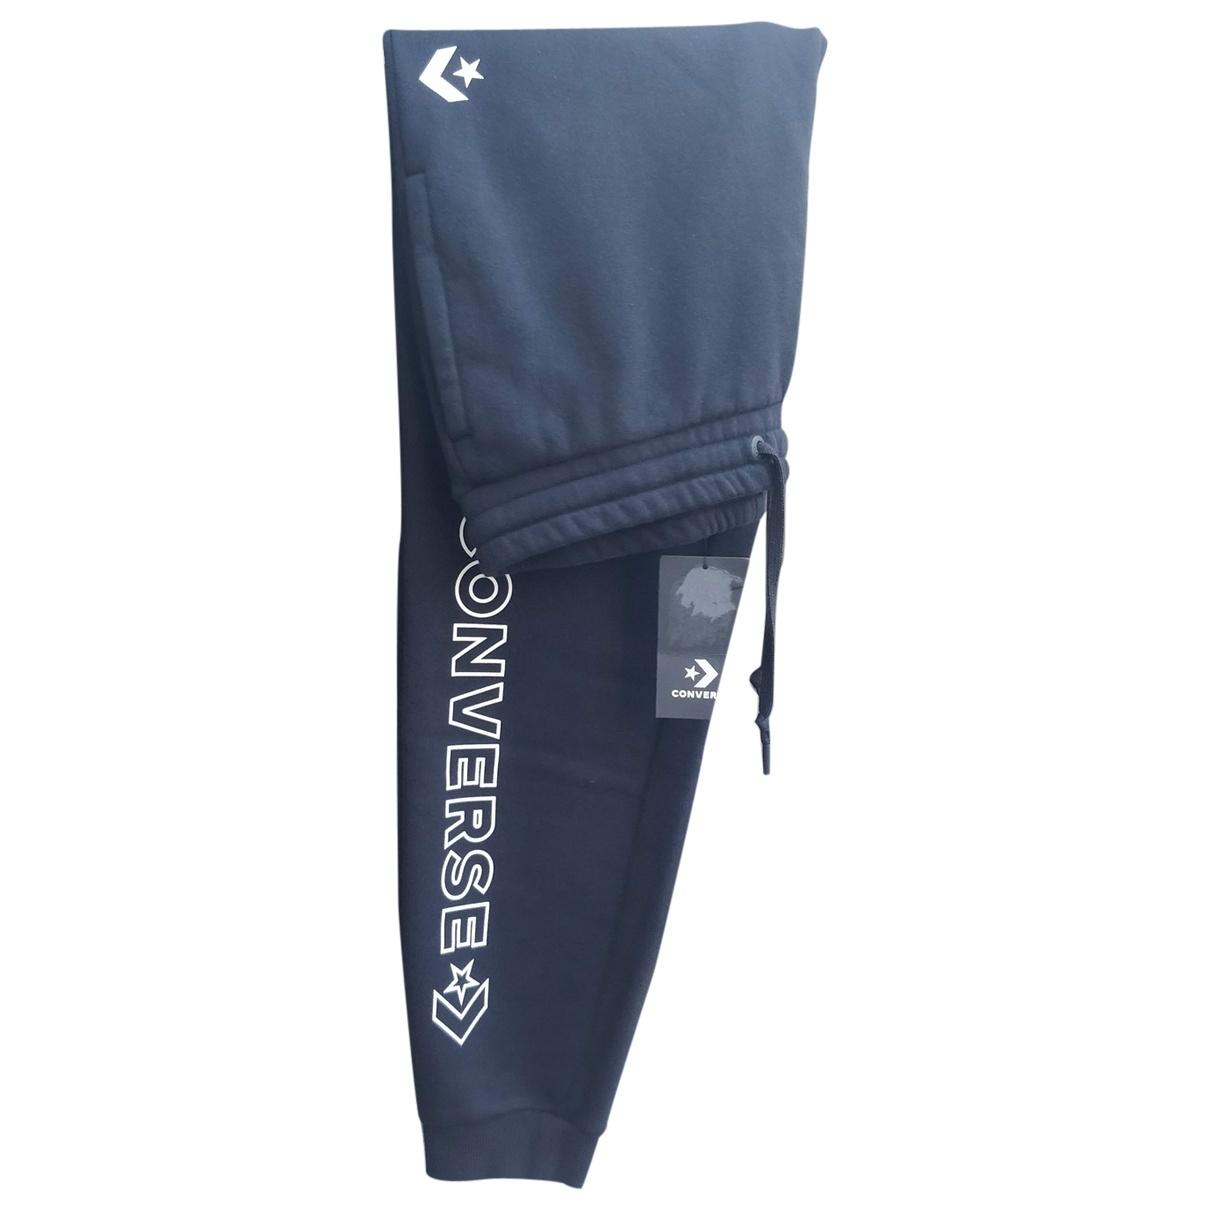 Converse \N Black Cotton Trousers for Men S International